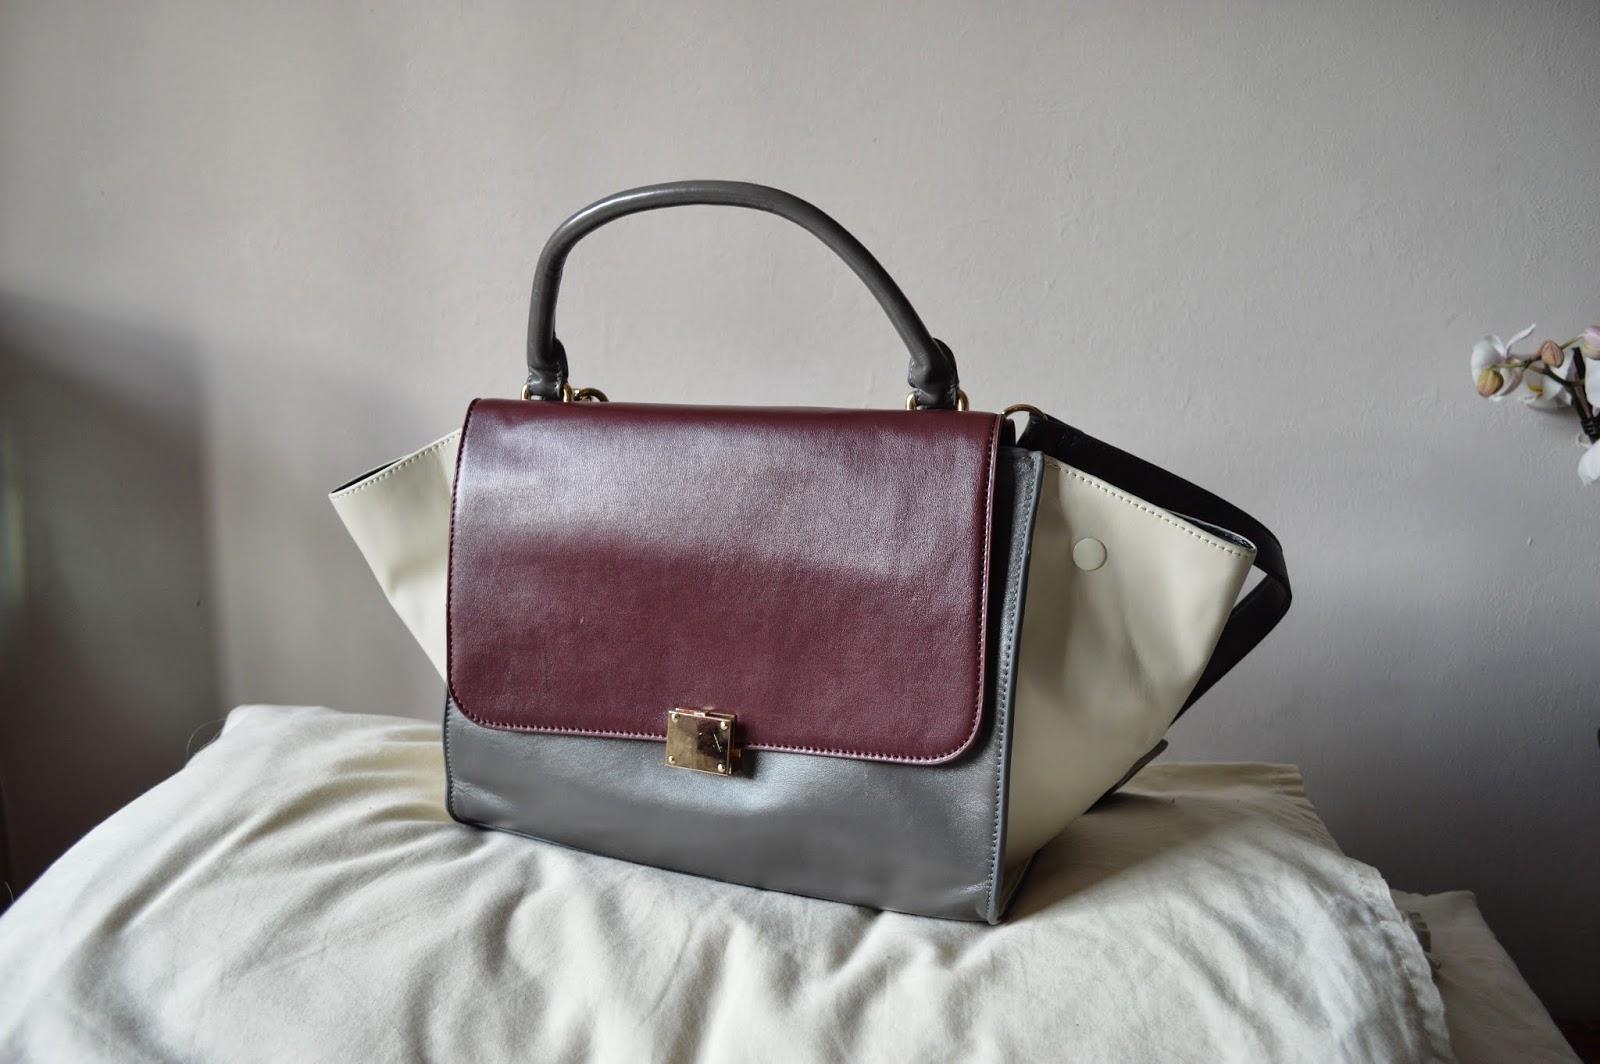 Sammi Jackson - Burgundy Trapeze Bag